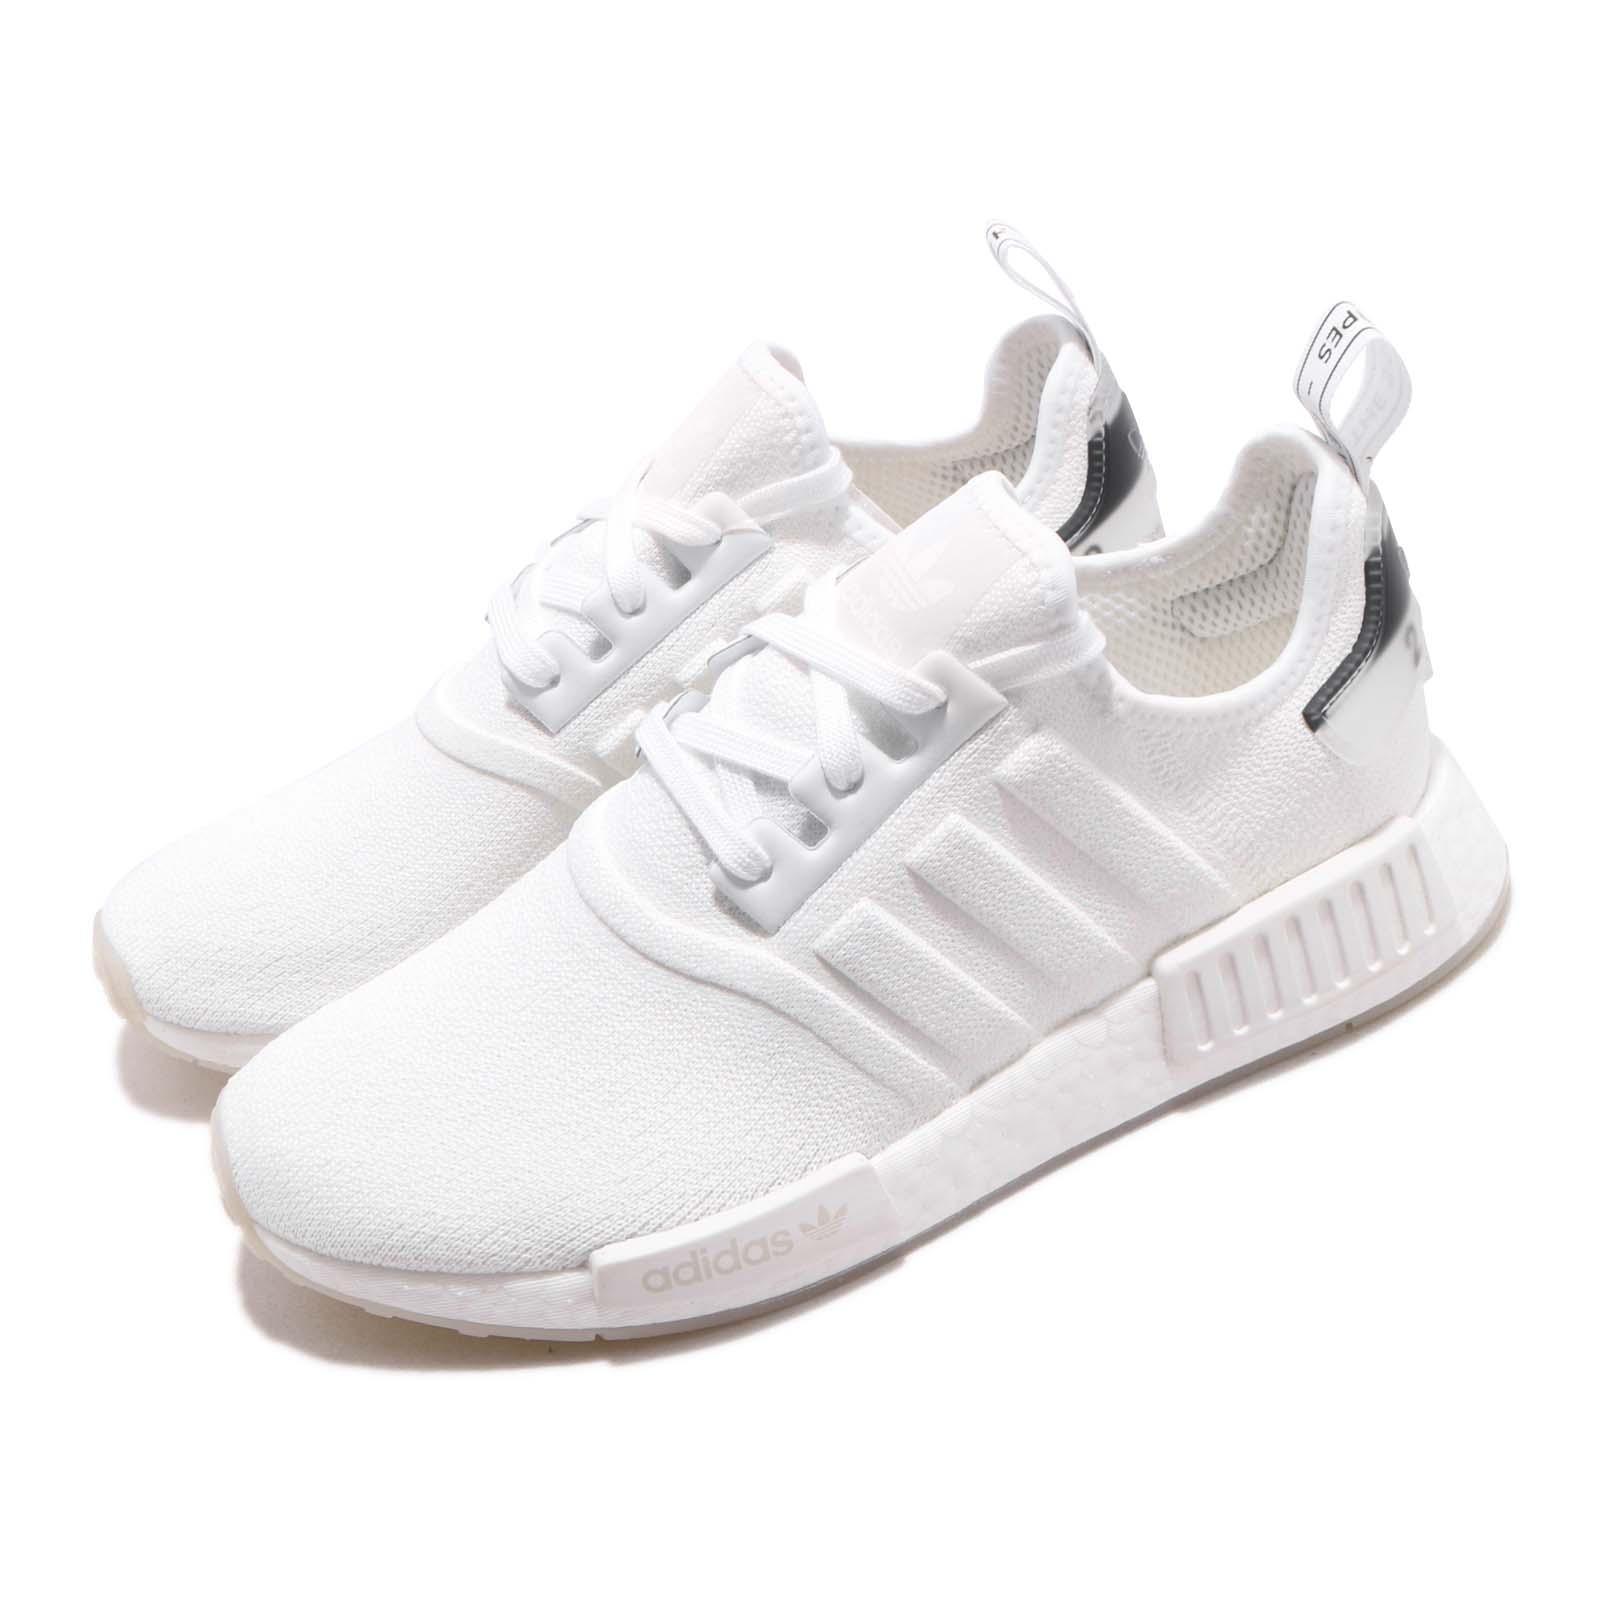 【ADIDAS】 NMD_R1 白 經典鞋 休閒鞋  慢跑鞋 男 訂價5290 BD7746 (Palace store) 0